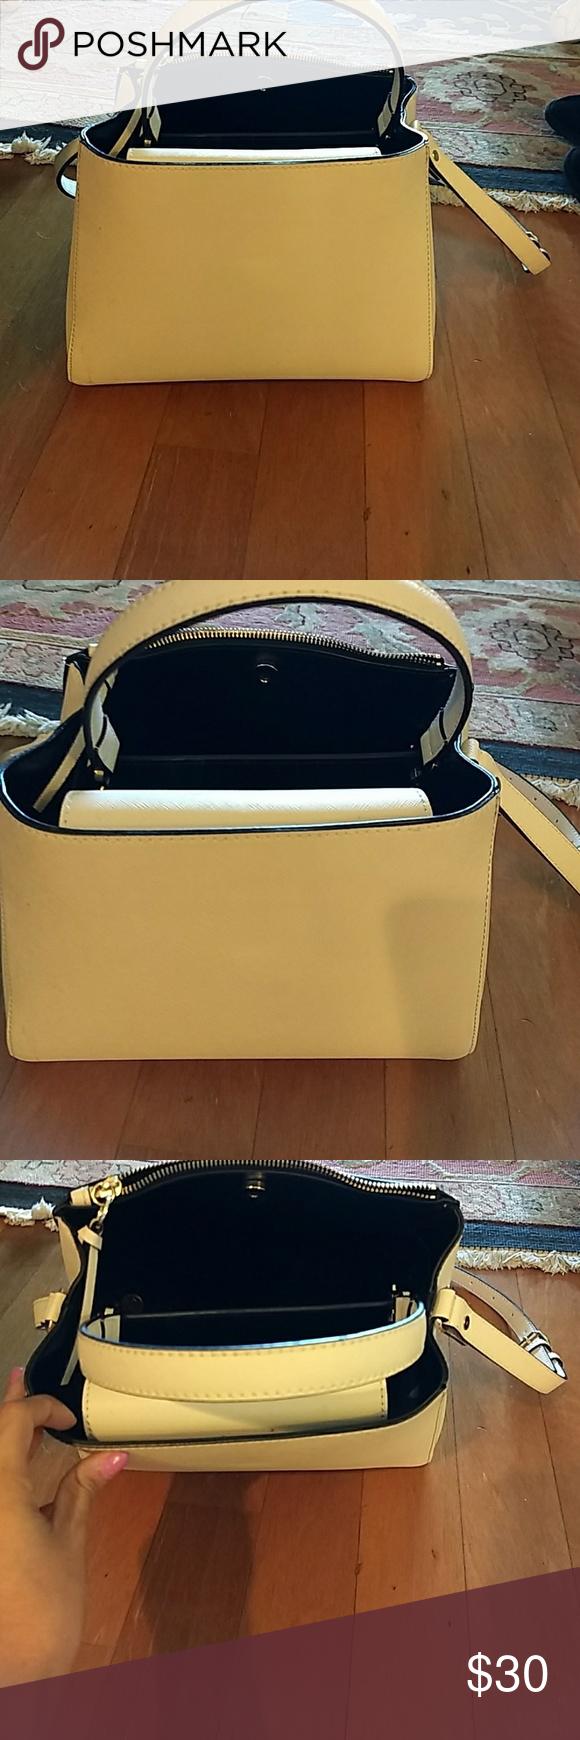 Cream zara handbag Zara handbags, Zara bags, Zara